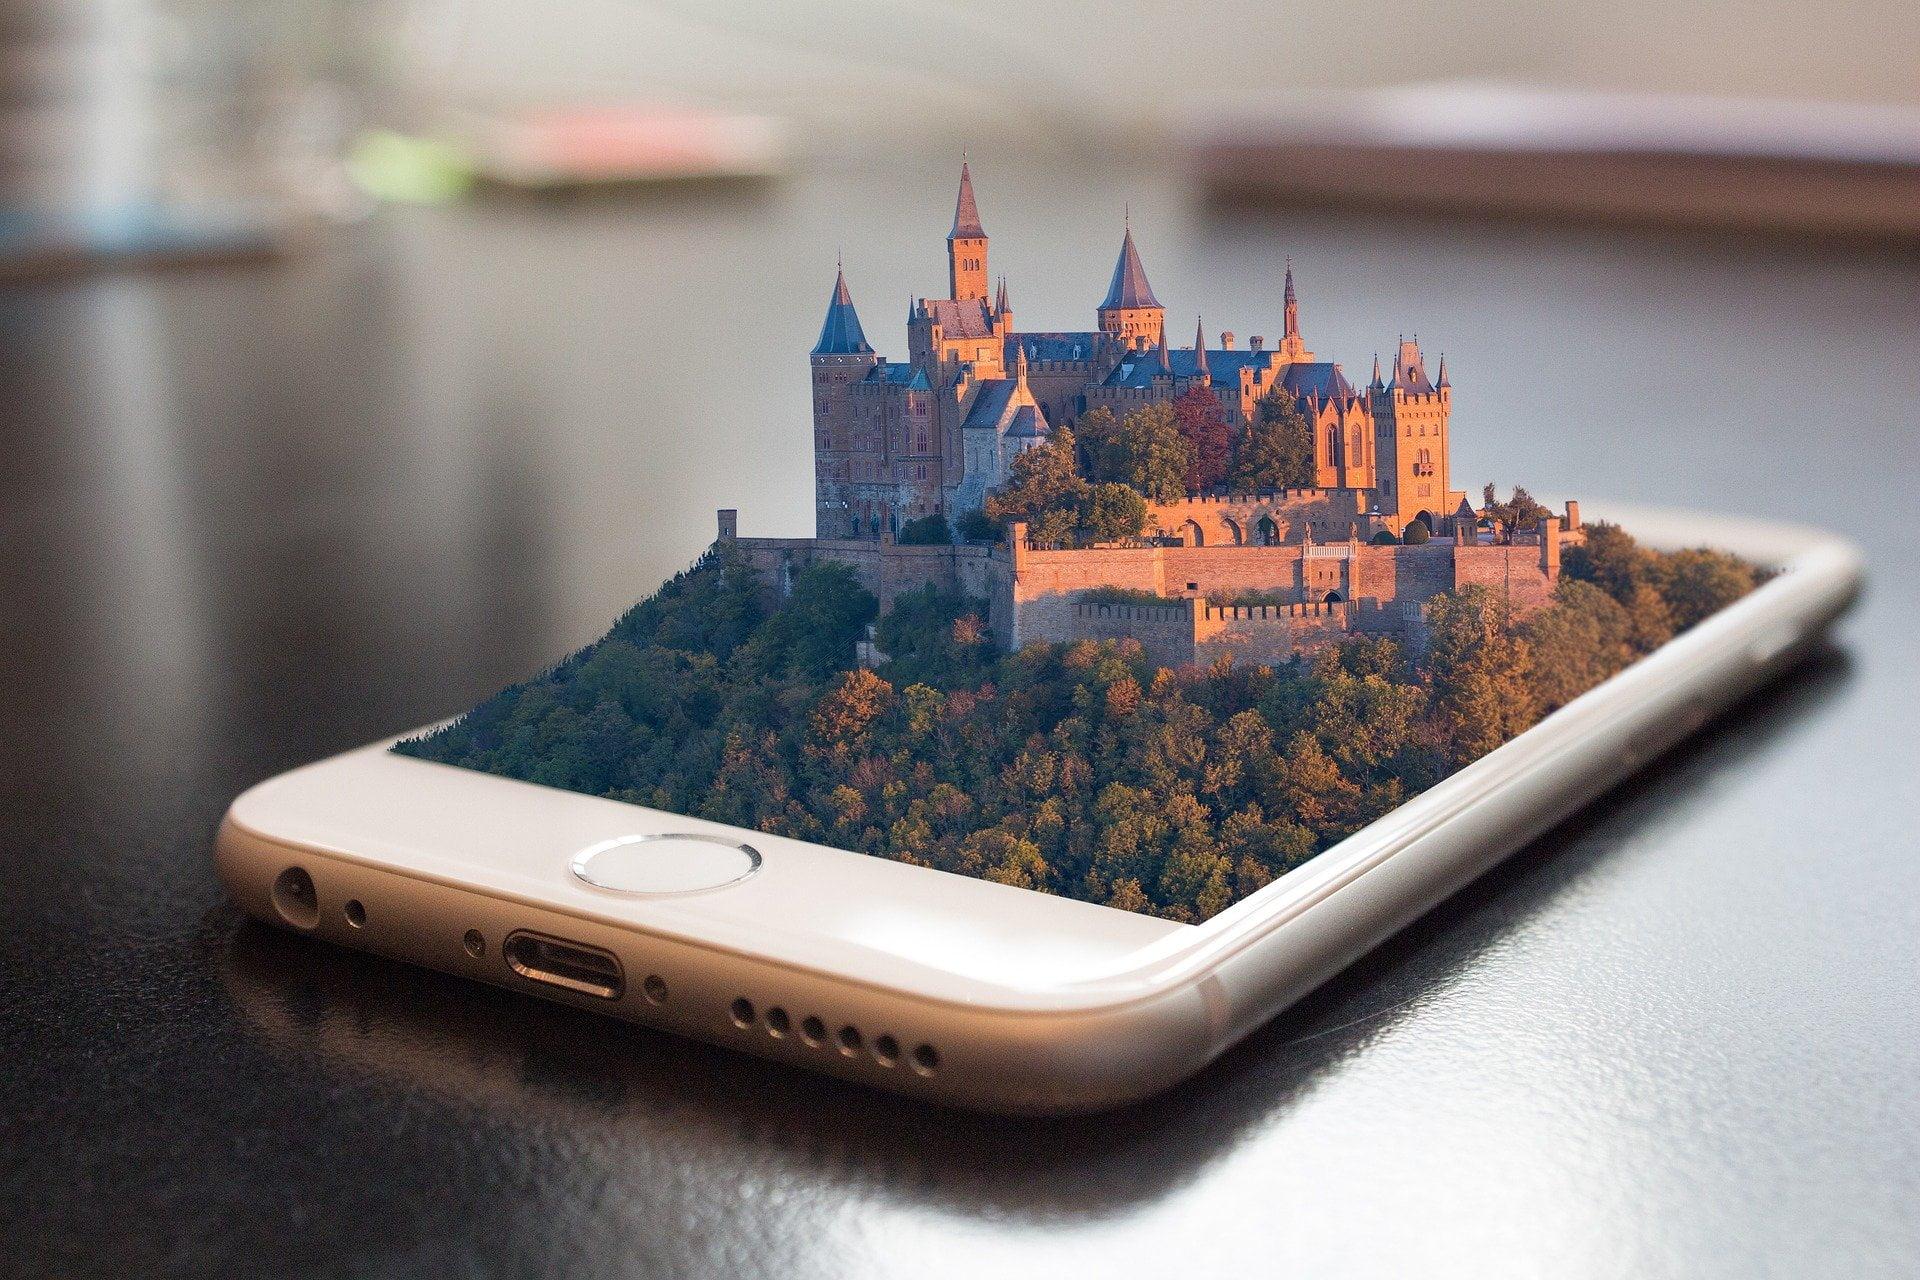 apps-moviles-edicion-fotografia-gratis-smartphone-teléfono-celular